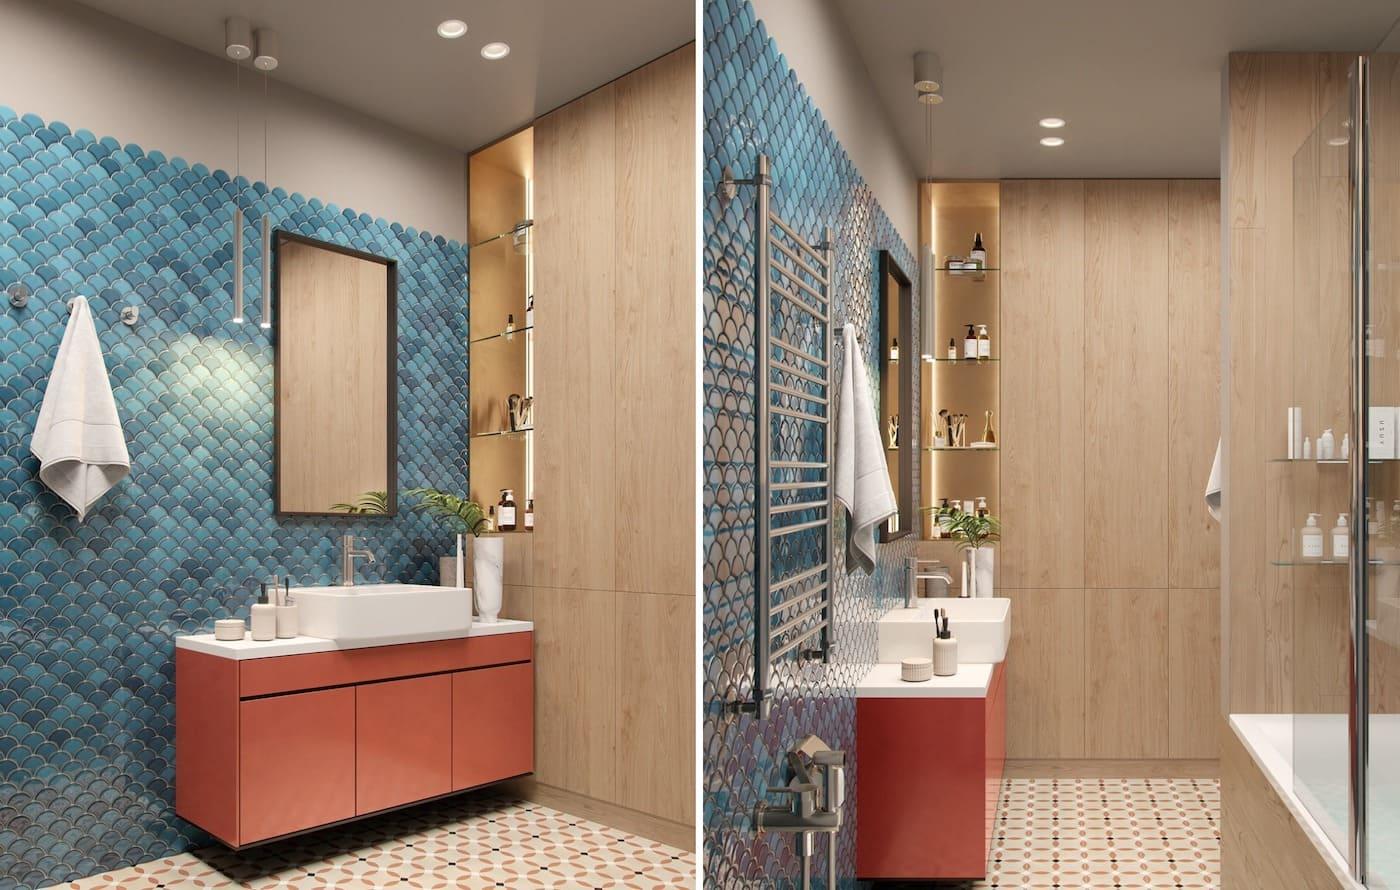 дизайн интерьера модной квартиры фото 61